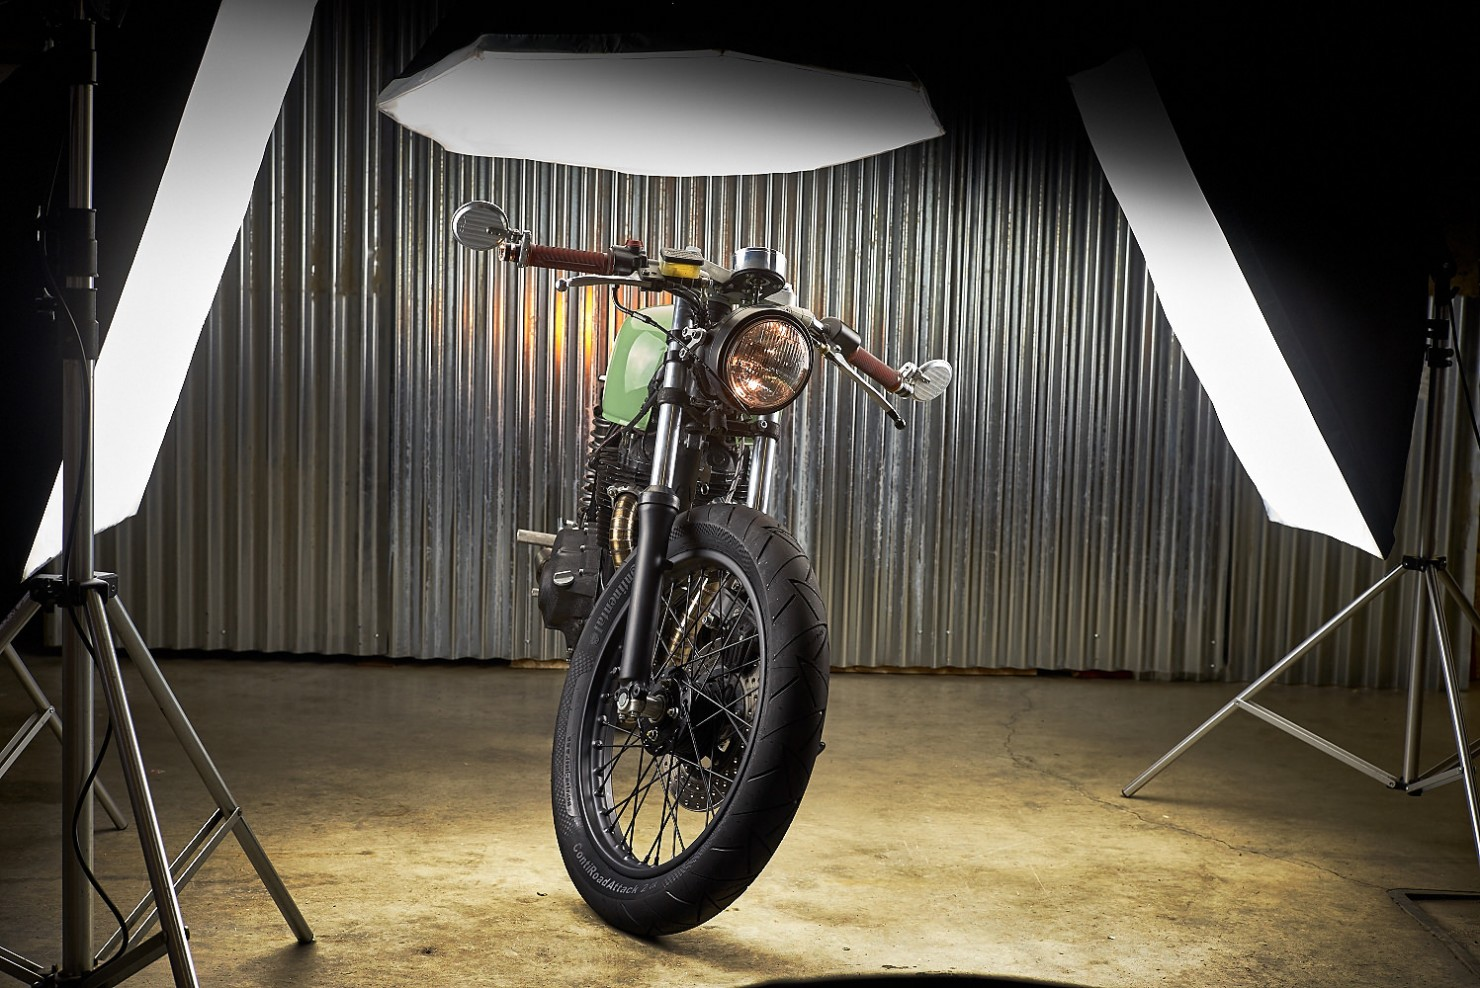 Honda-CB360-Motorcycle-17